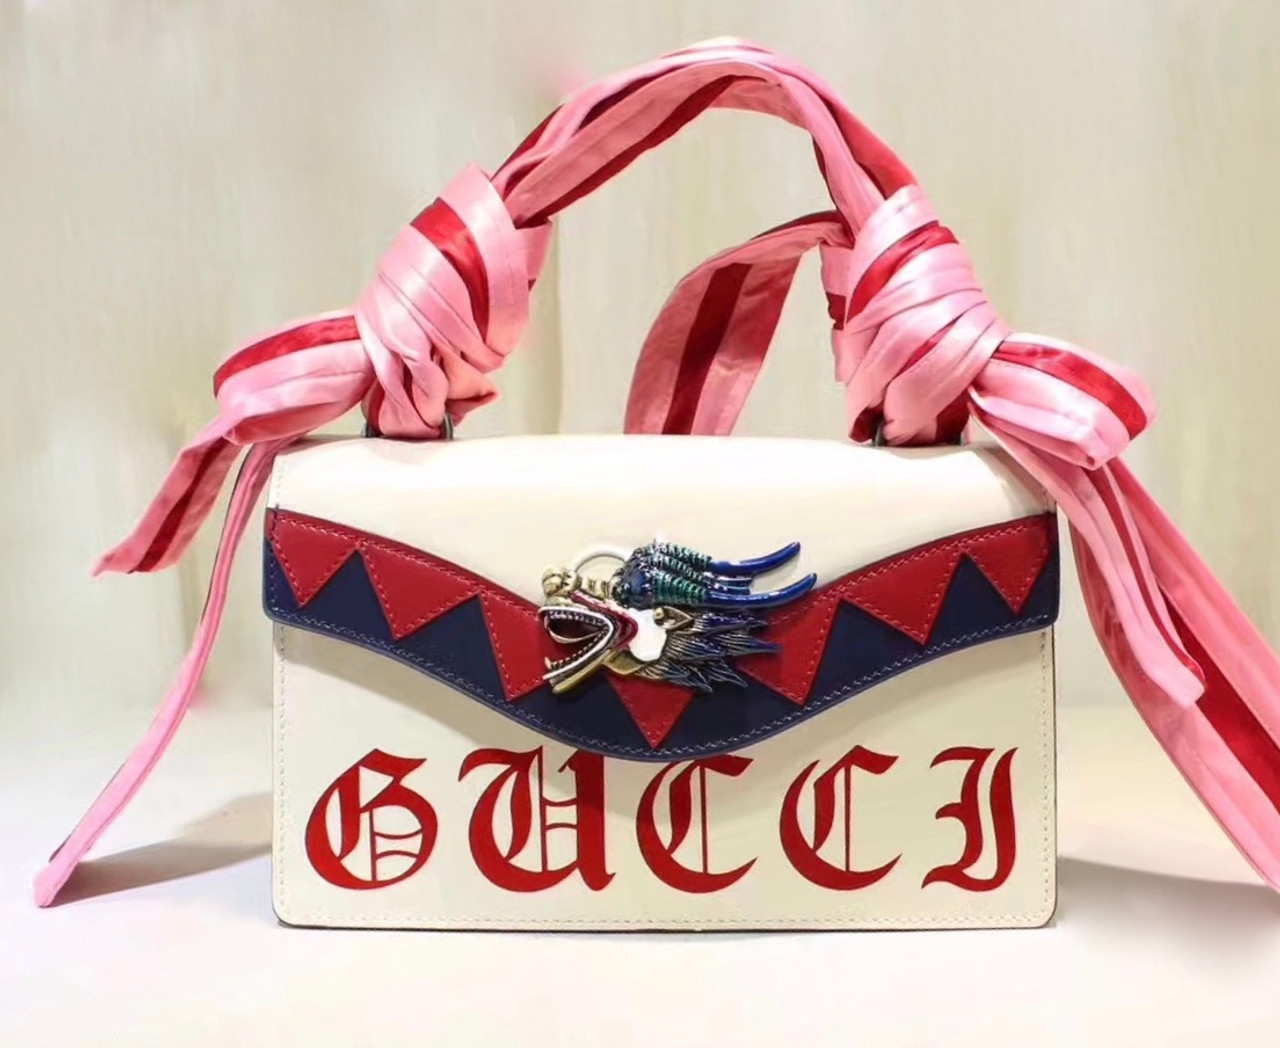 d9a35e7161 Gucci 2018 Osiride leather top handle bag - Bella Vita Moda